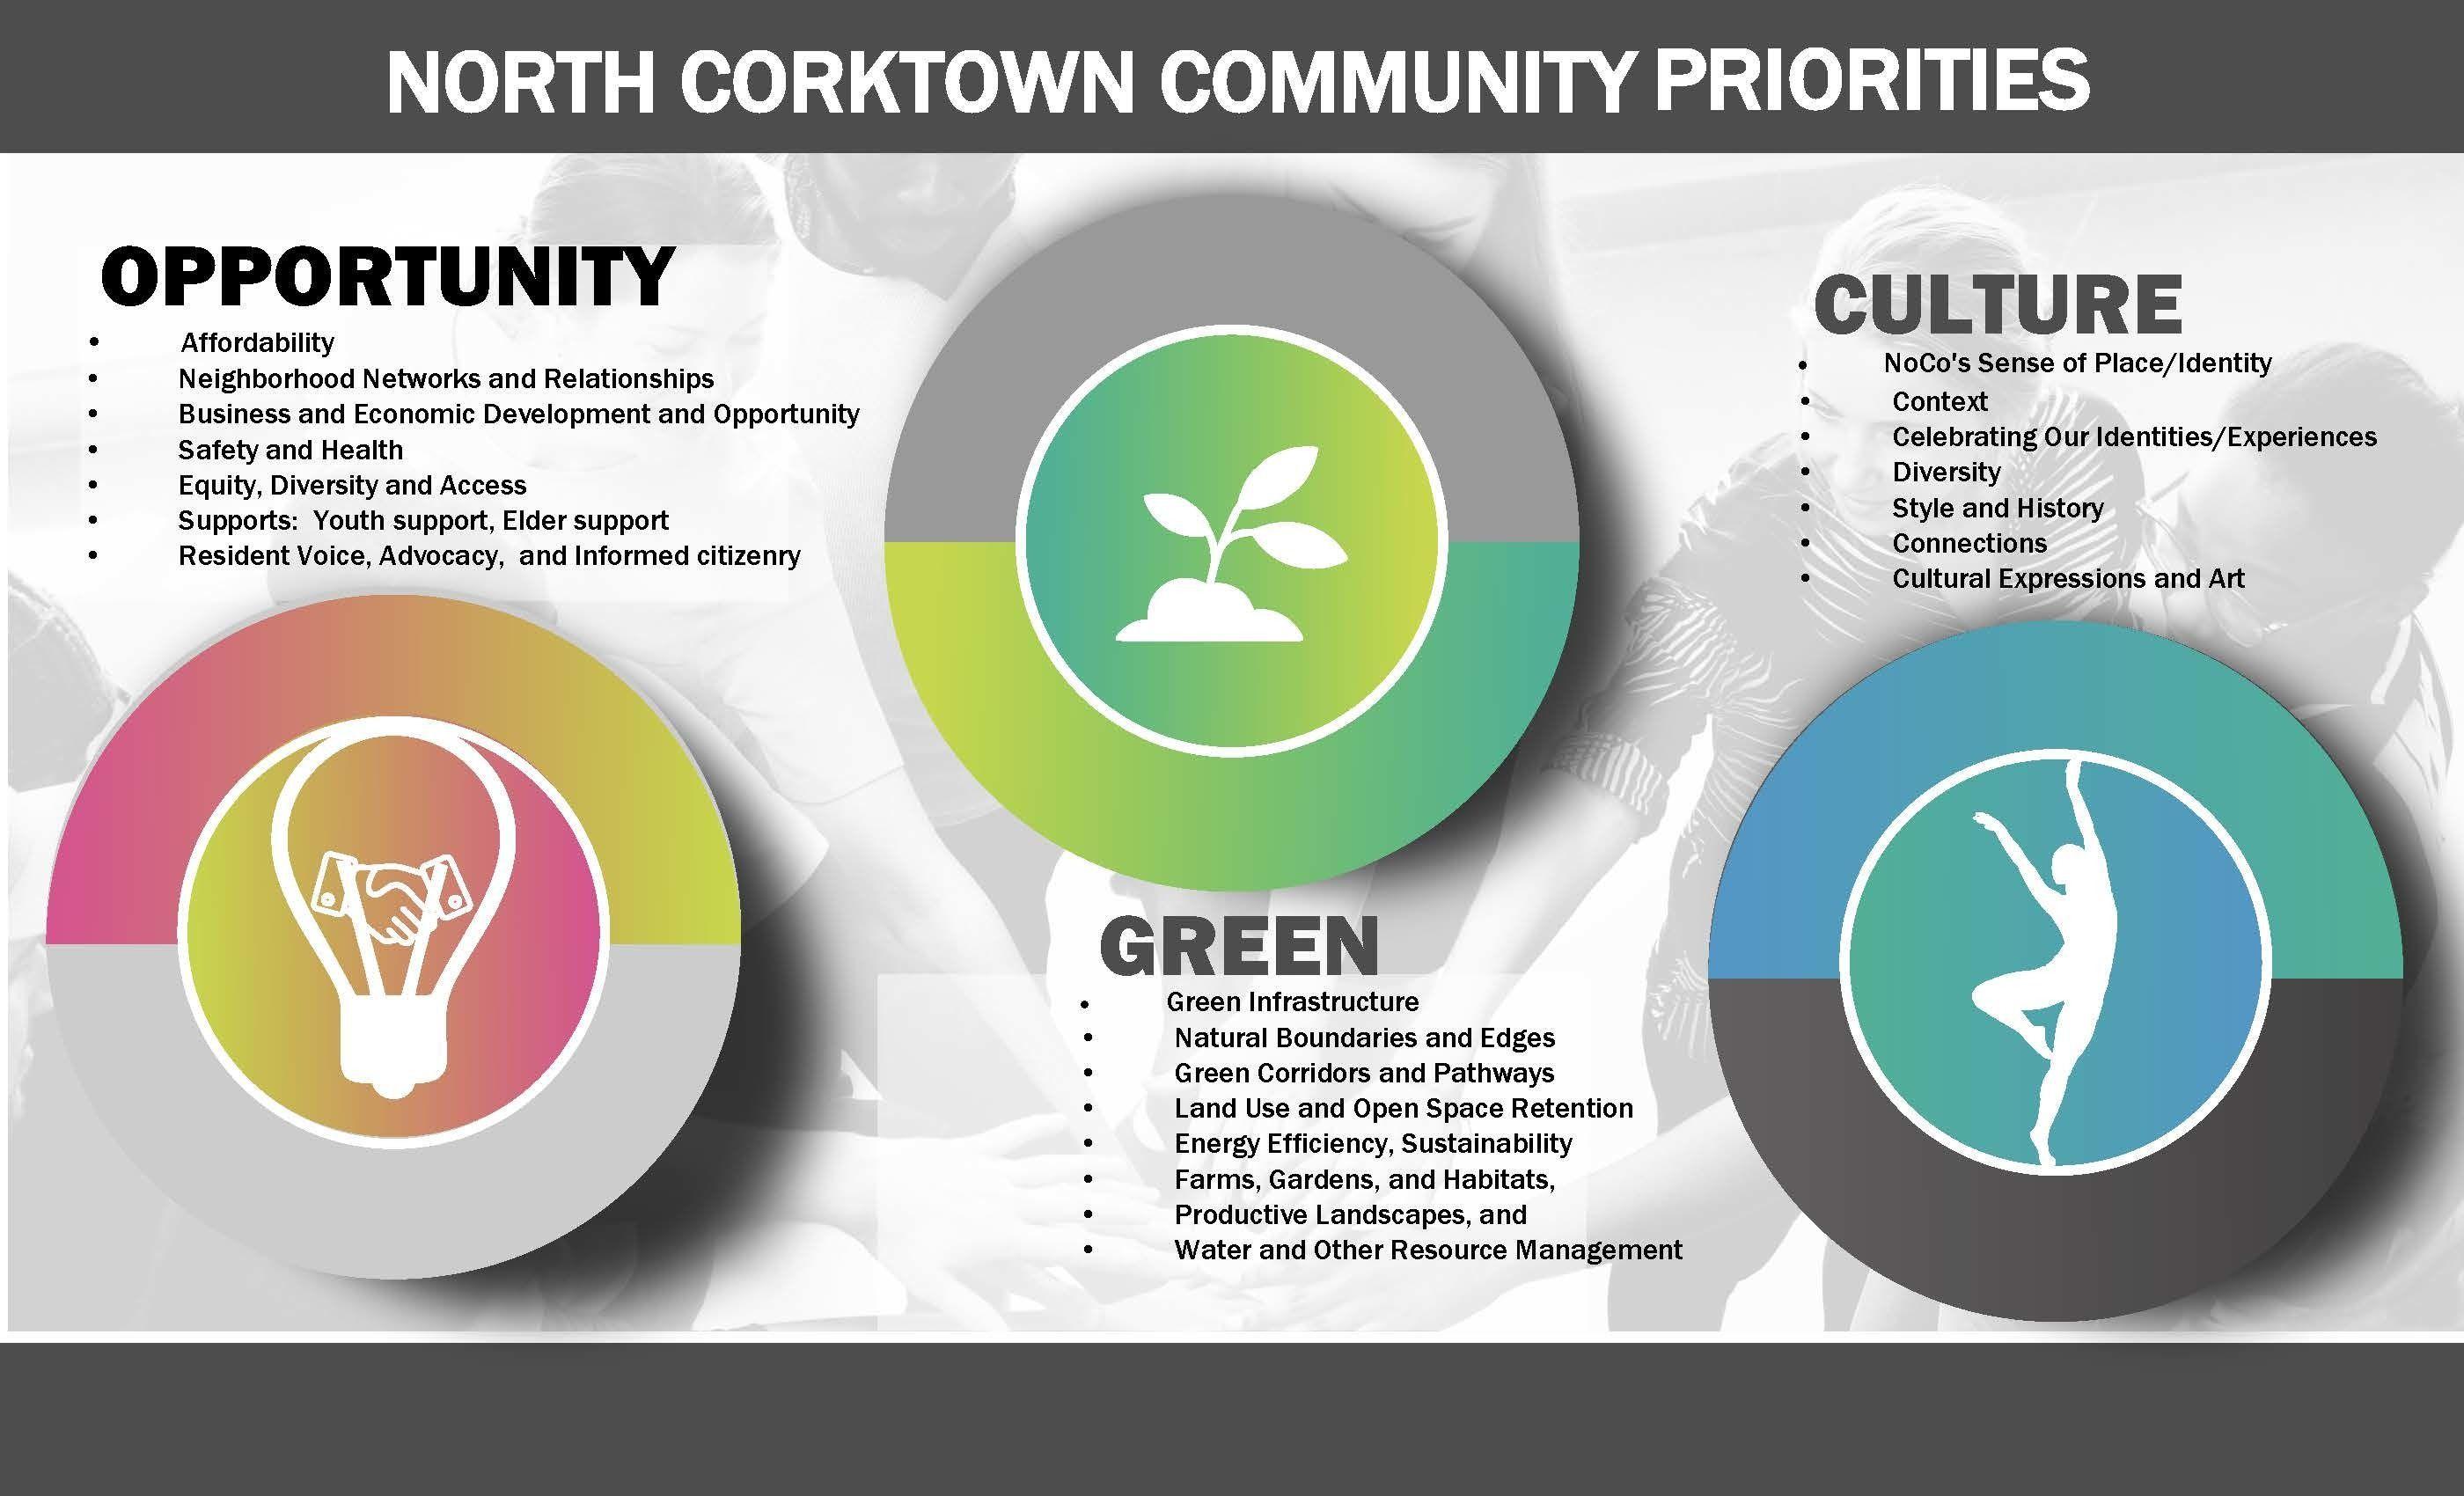 NoCo Guiding Principles/Priorities for Redevelopment